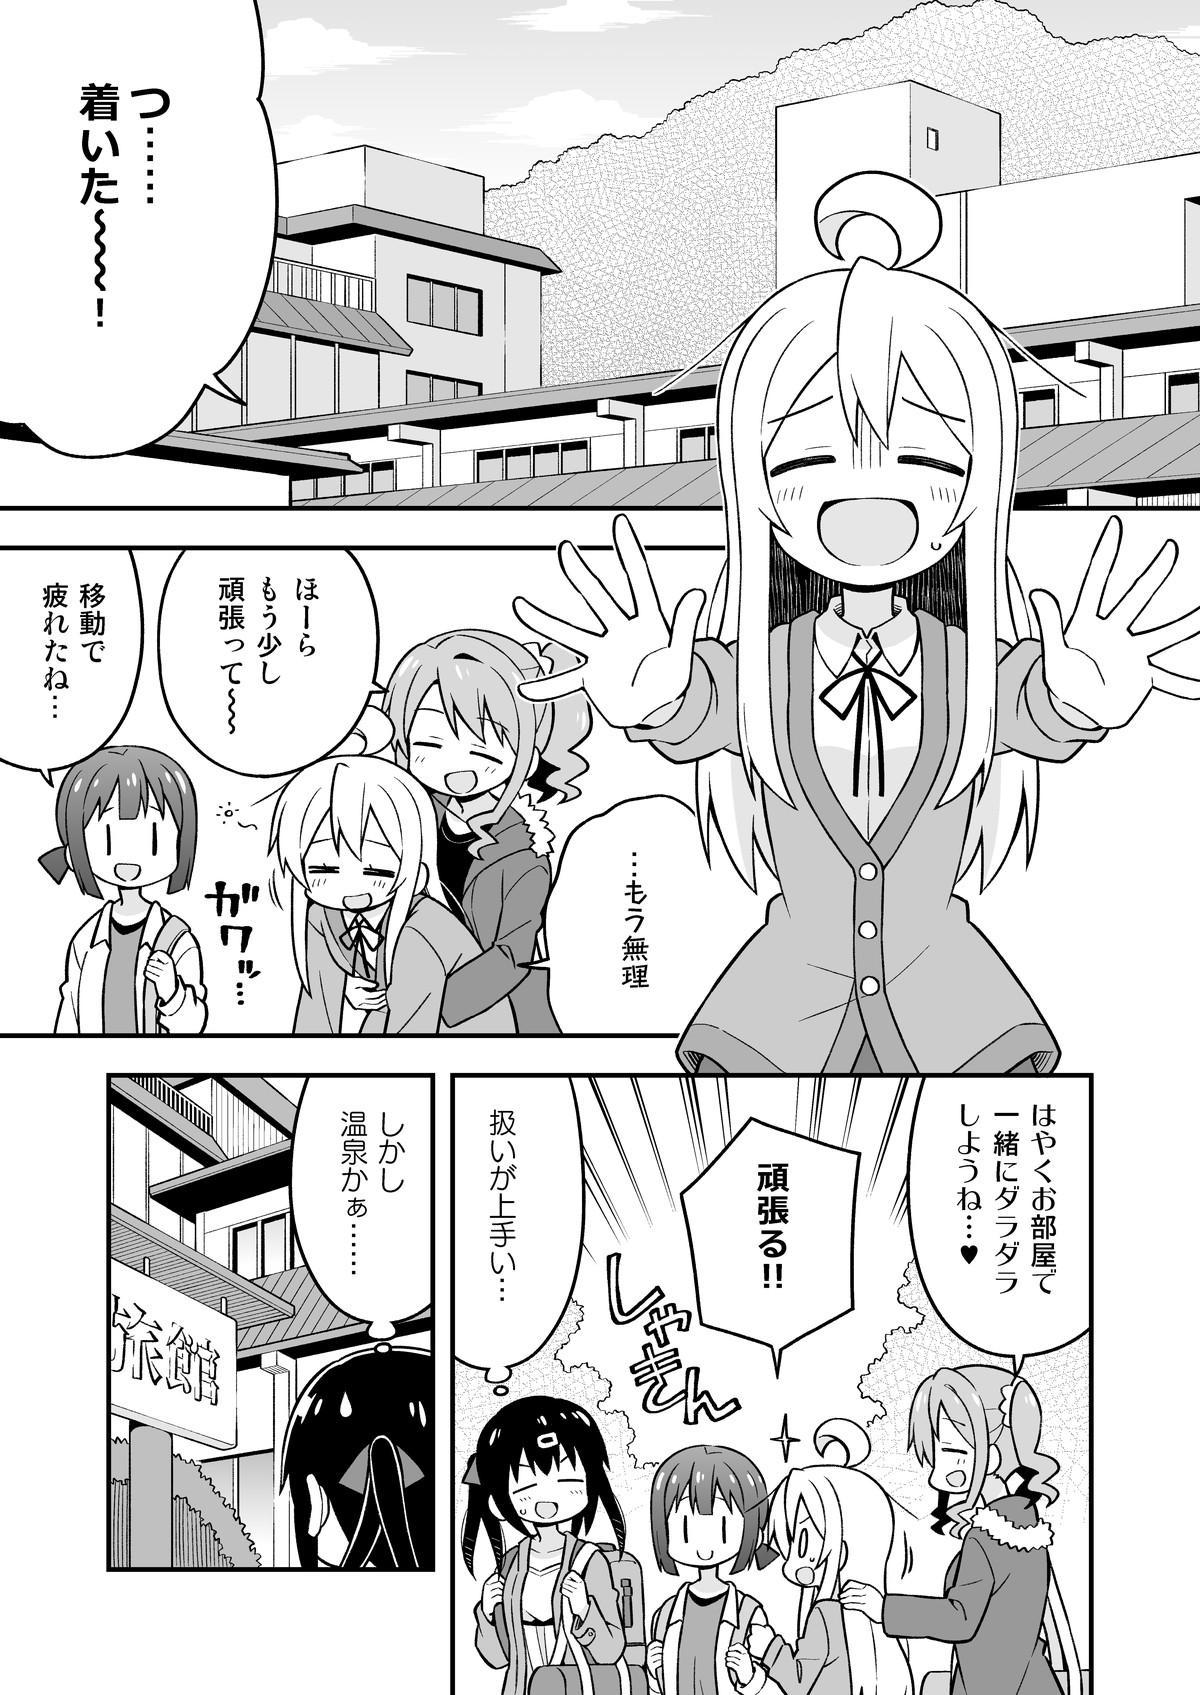 Onii-chan wa Oshimai! 6 15